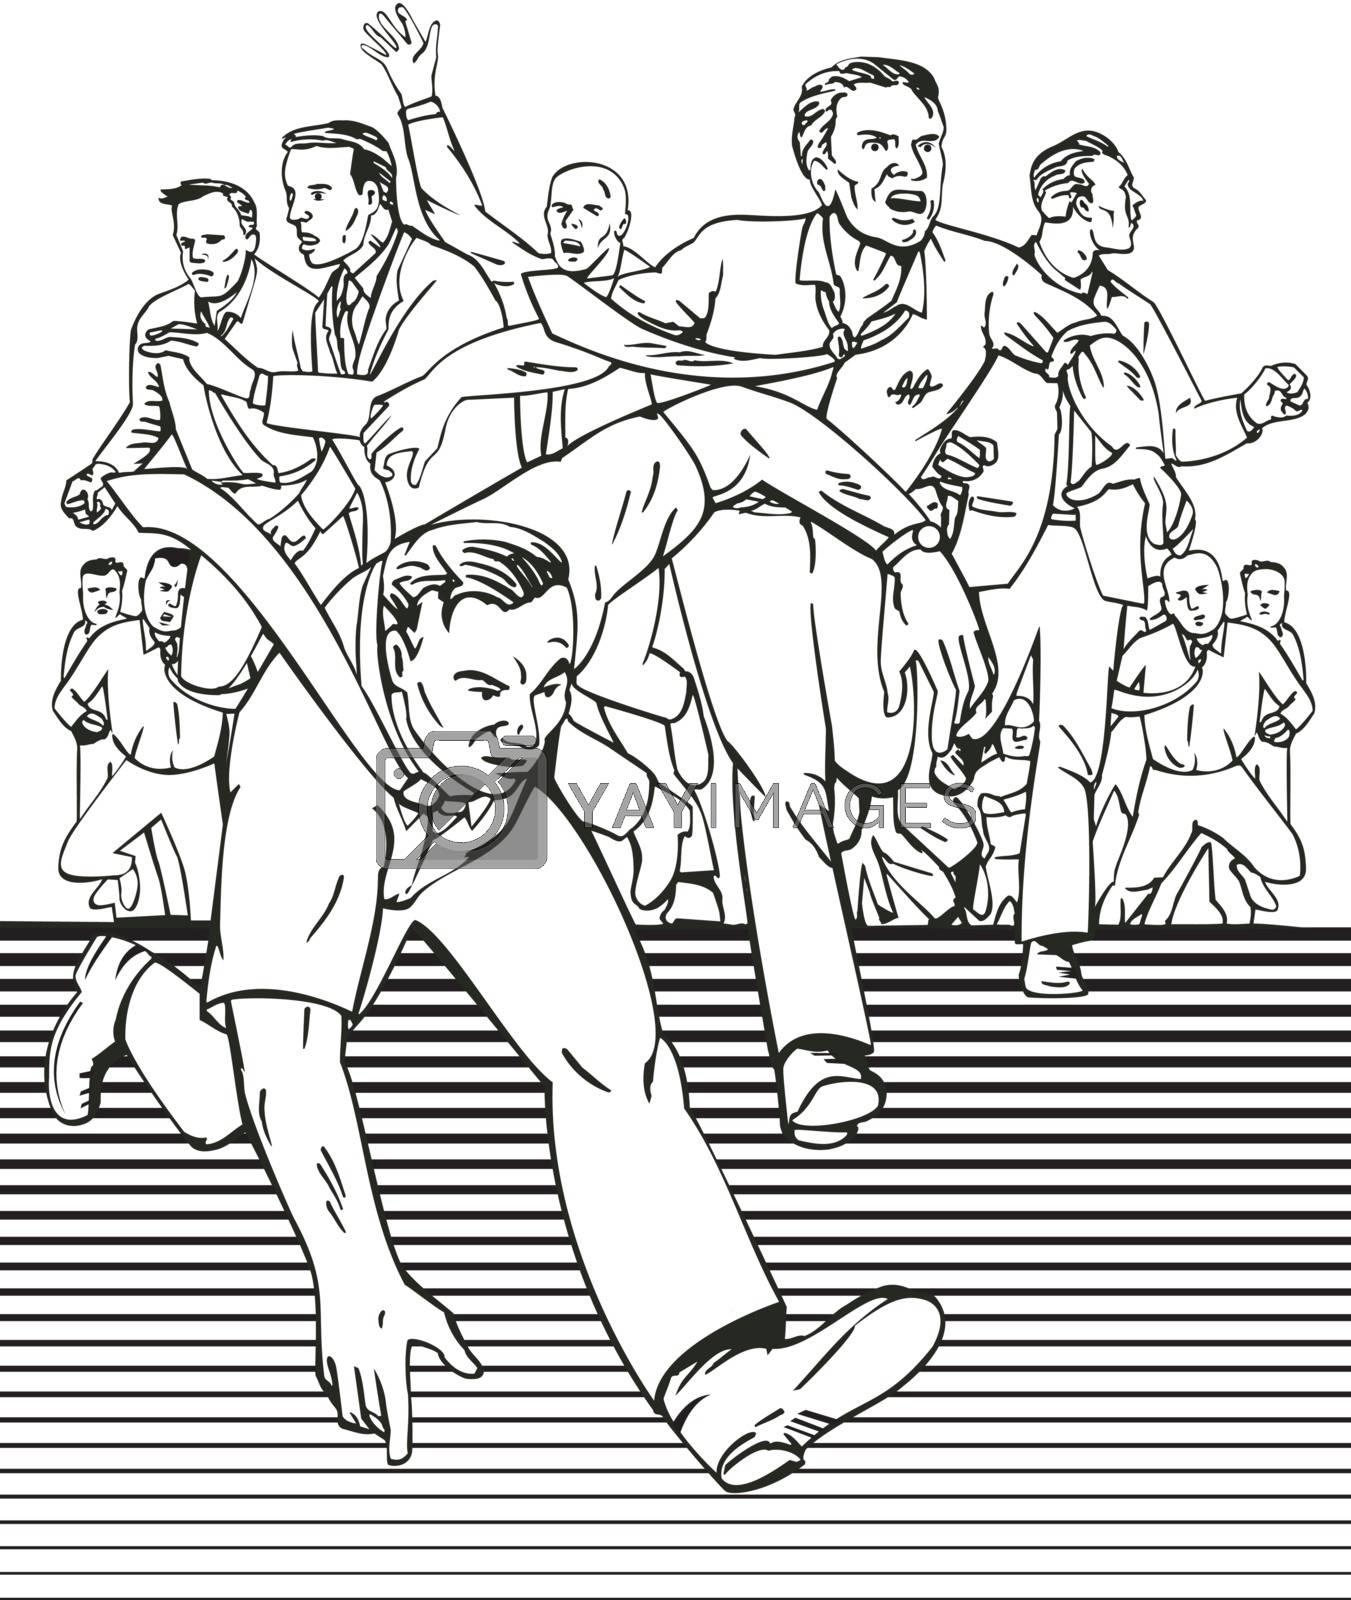 People Running by patrimonio